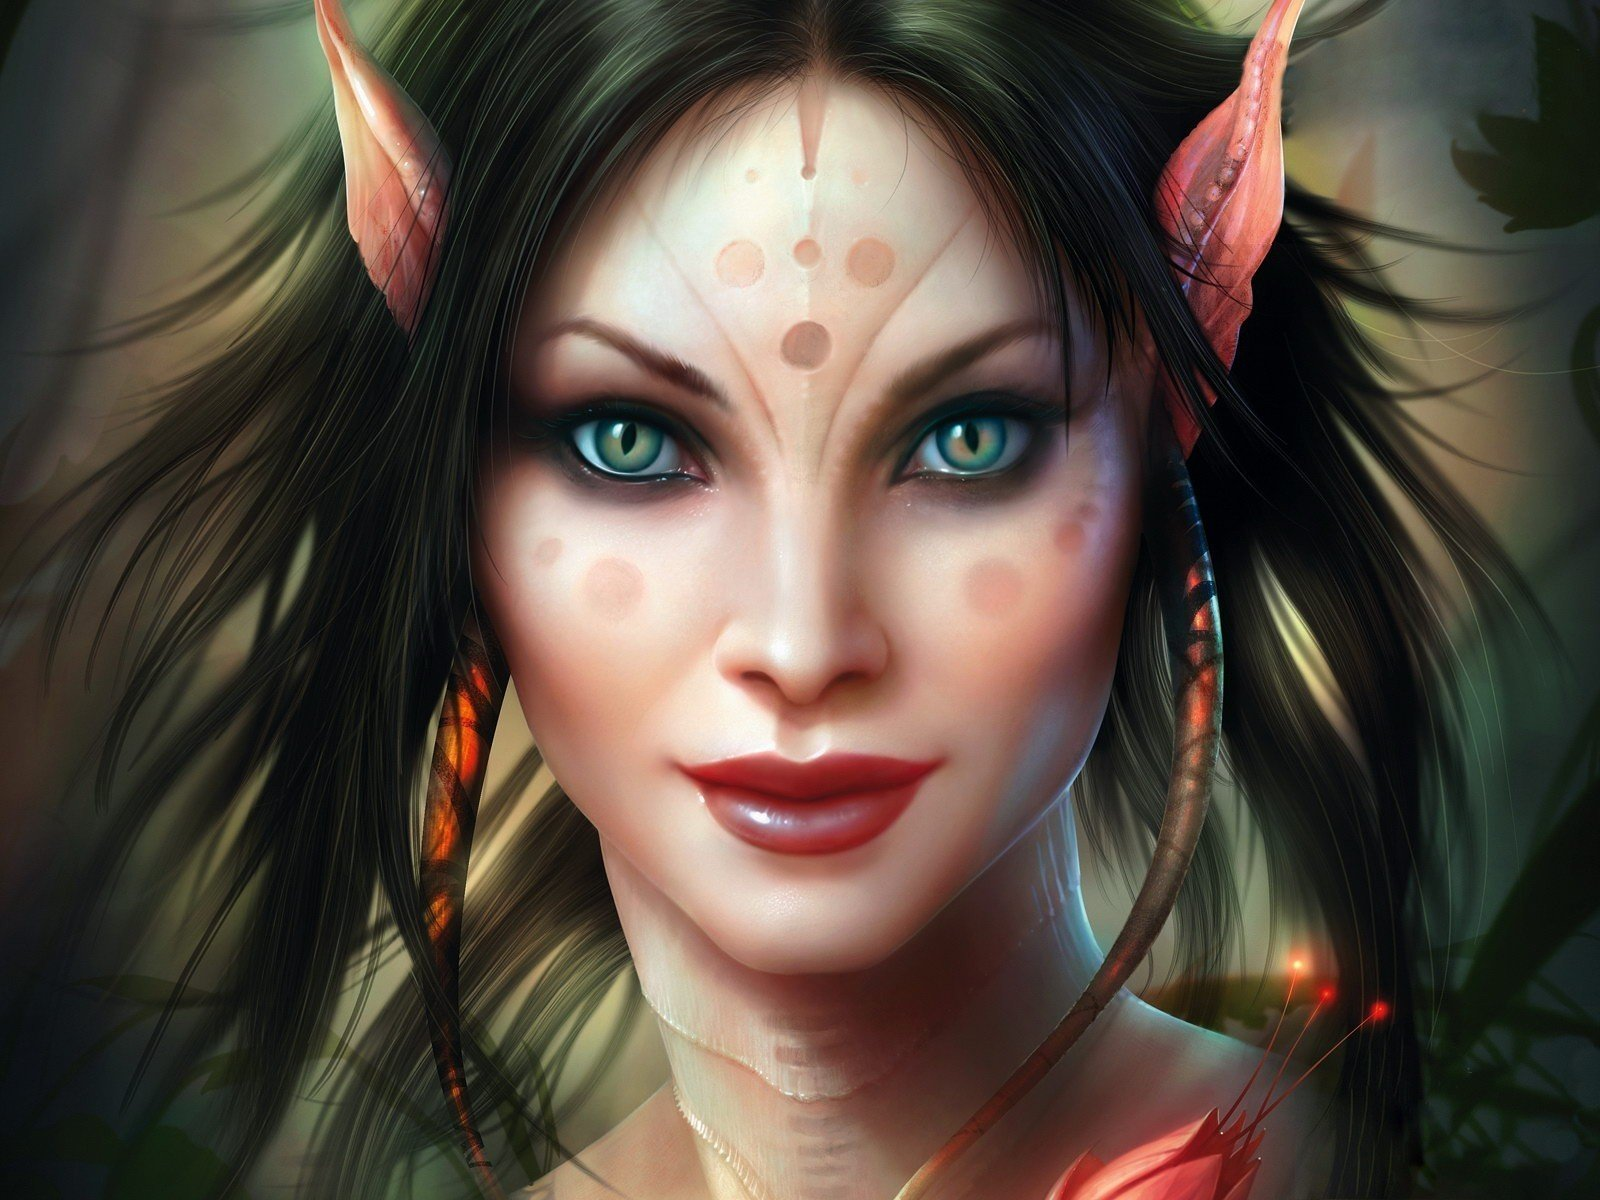 Women Fantasy Wallpaper 1600x1200 Women Fantasy Art Elves Faces 1600x1200